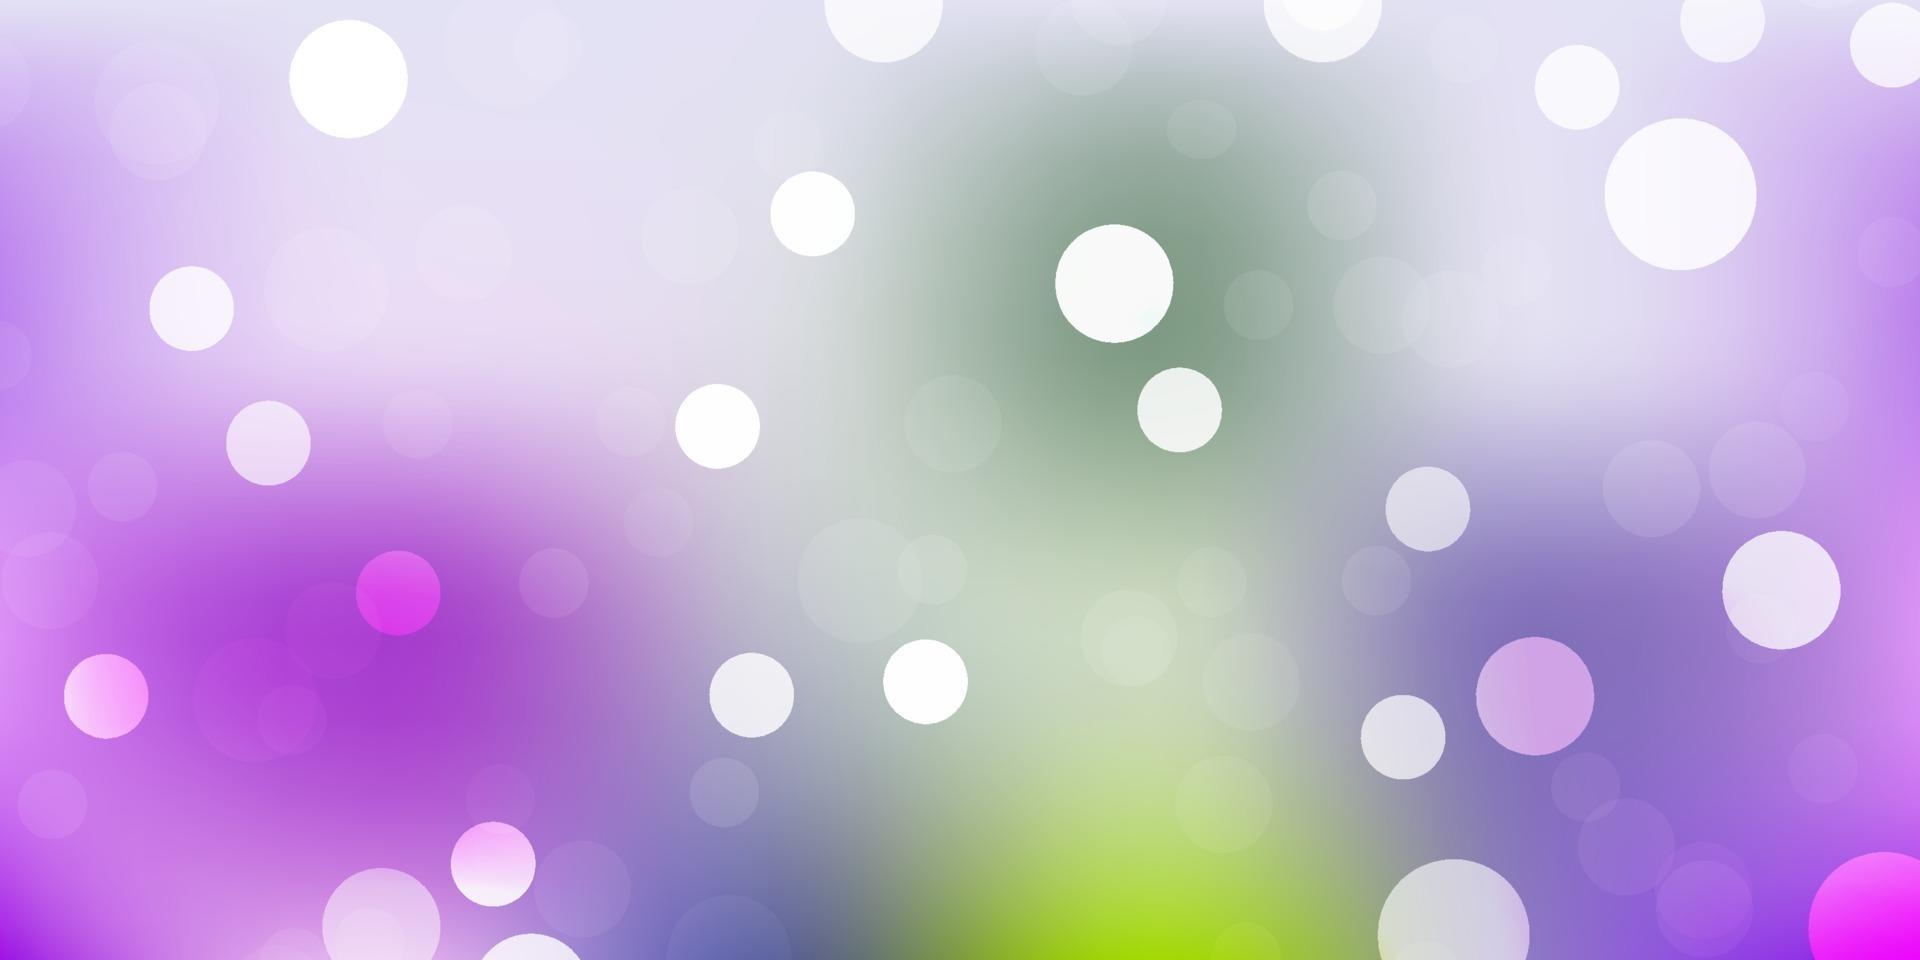 Fondo de vector rosa claro, verde con puntos.